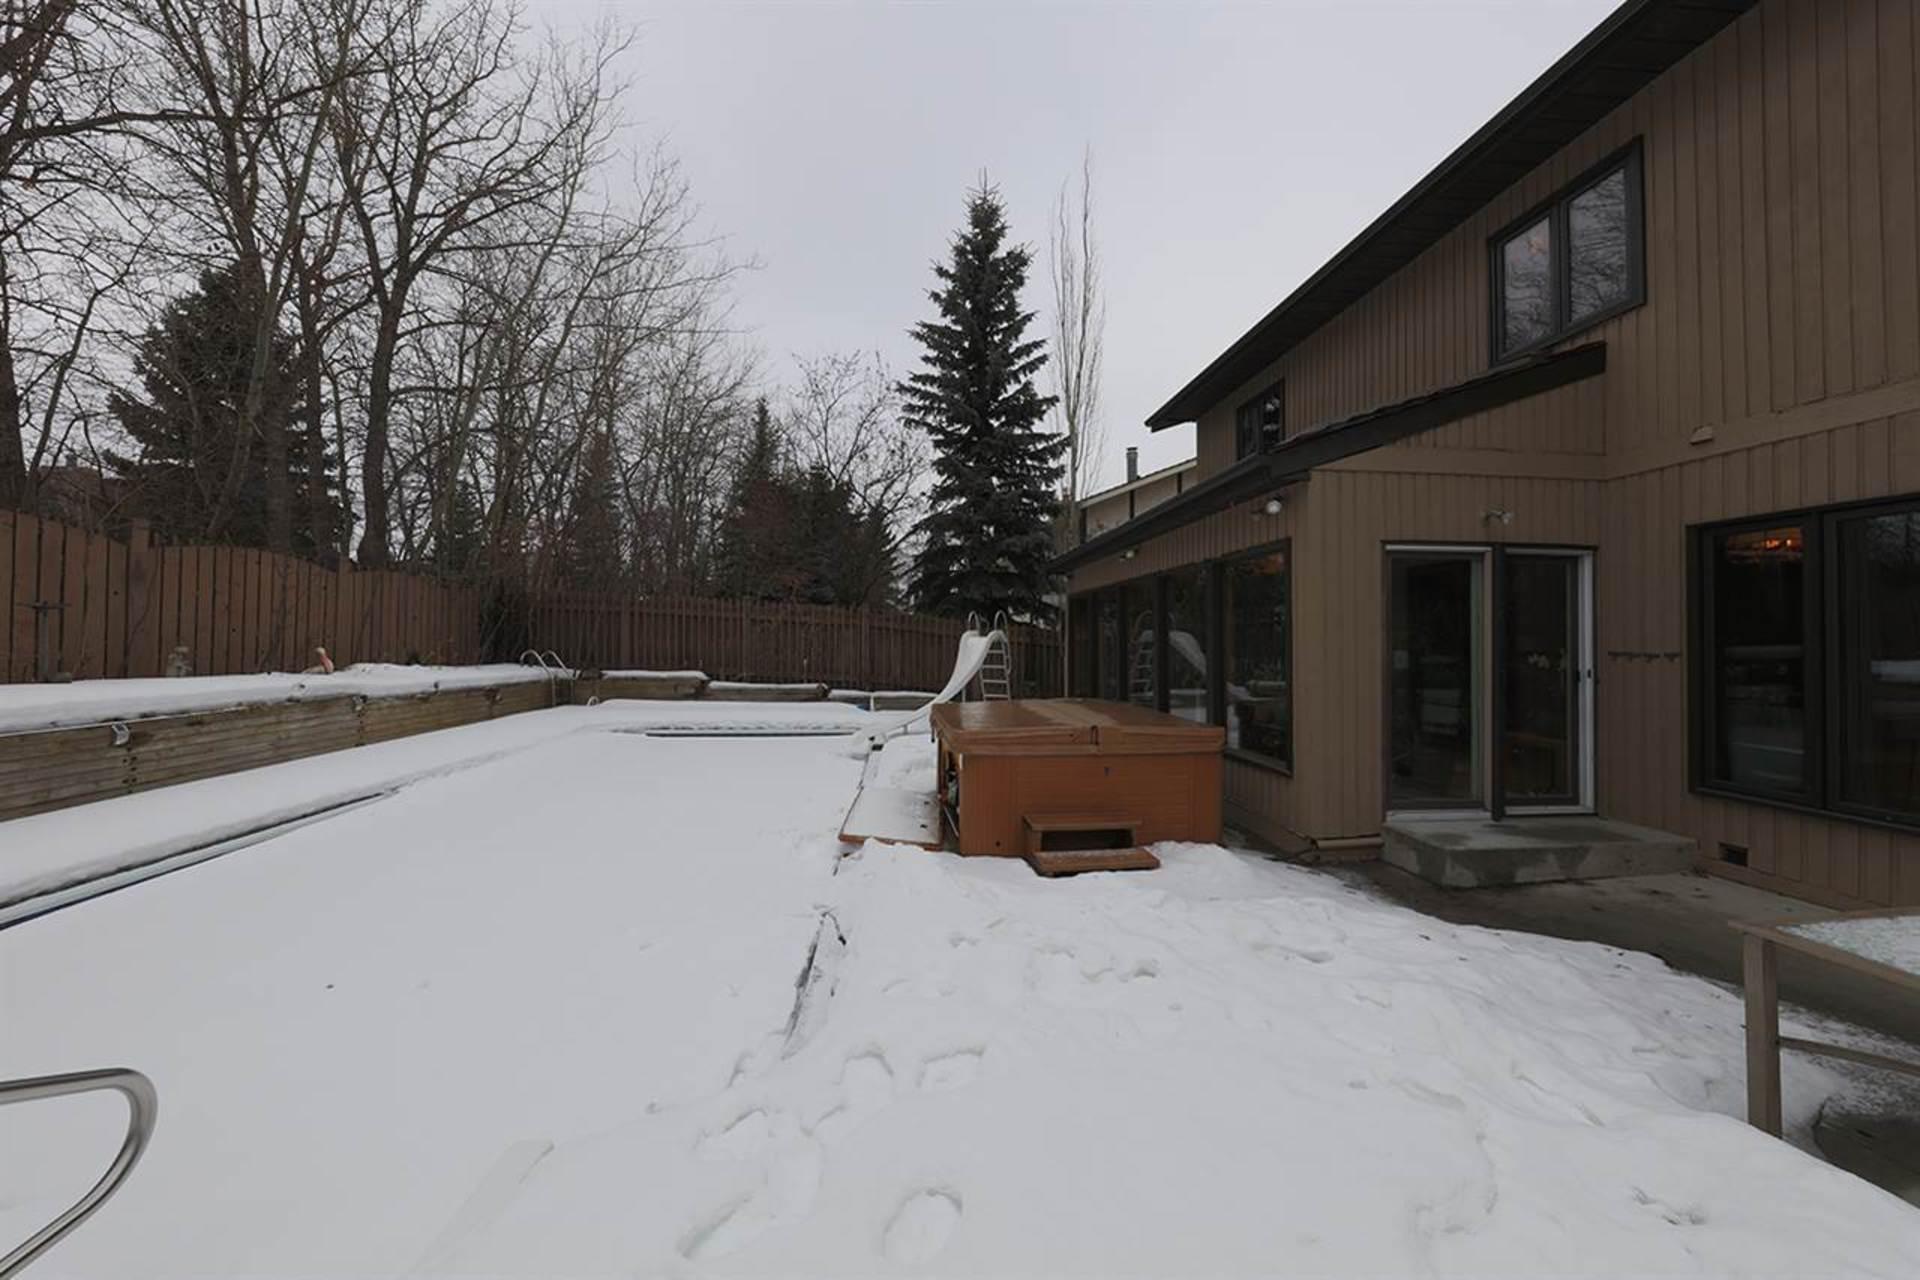 665-romaniuk-road-rhatigan-ridge-edmonton-27 at 665 Romaniuk Road, Rhatigan Ridge, Edmonton